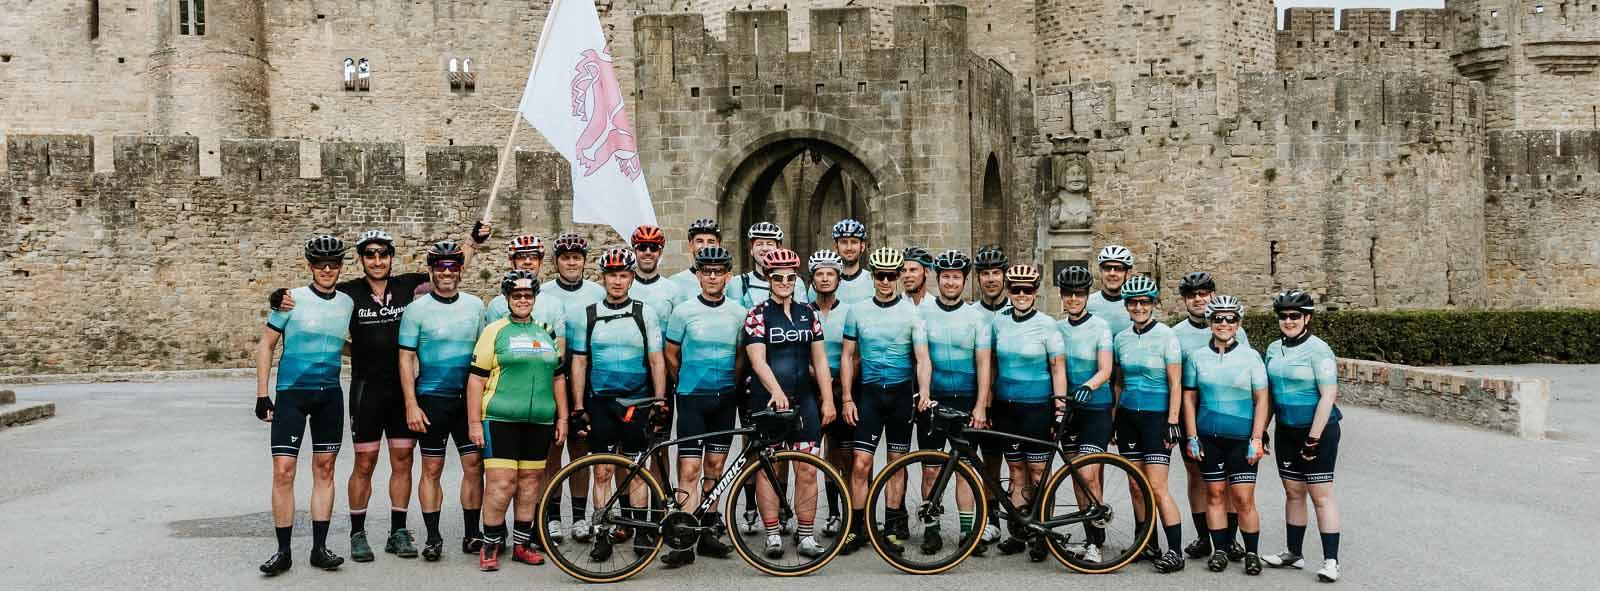 Europe Cycling Tours Barcelona To Rome Hannibal Bike